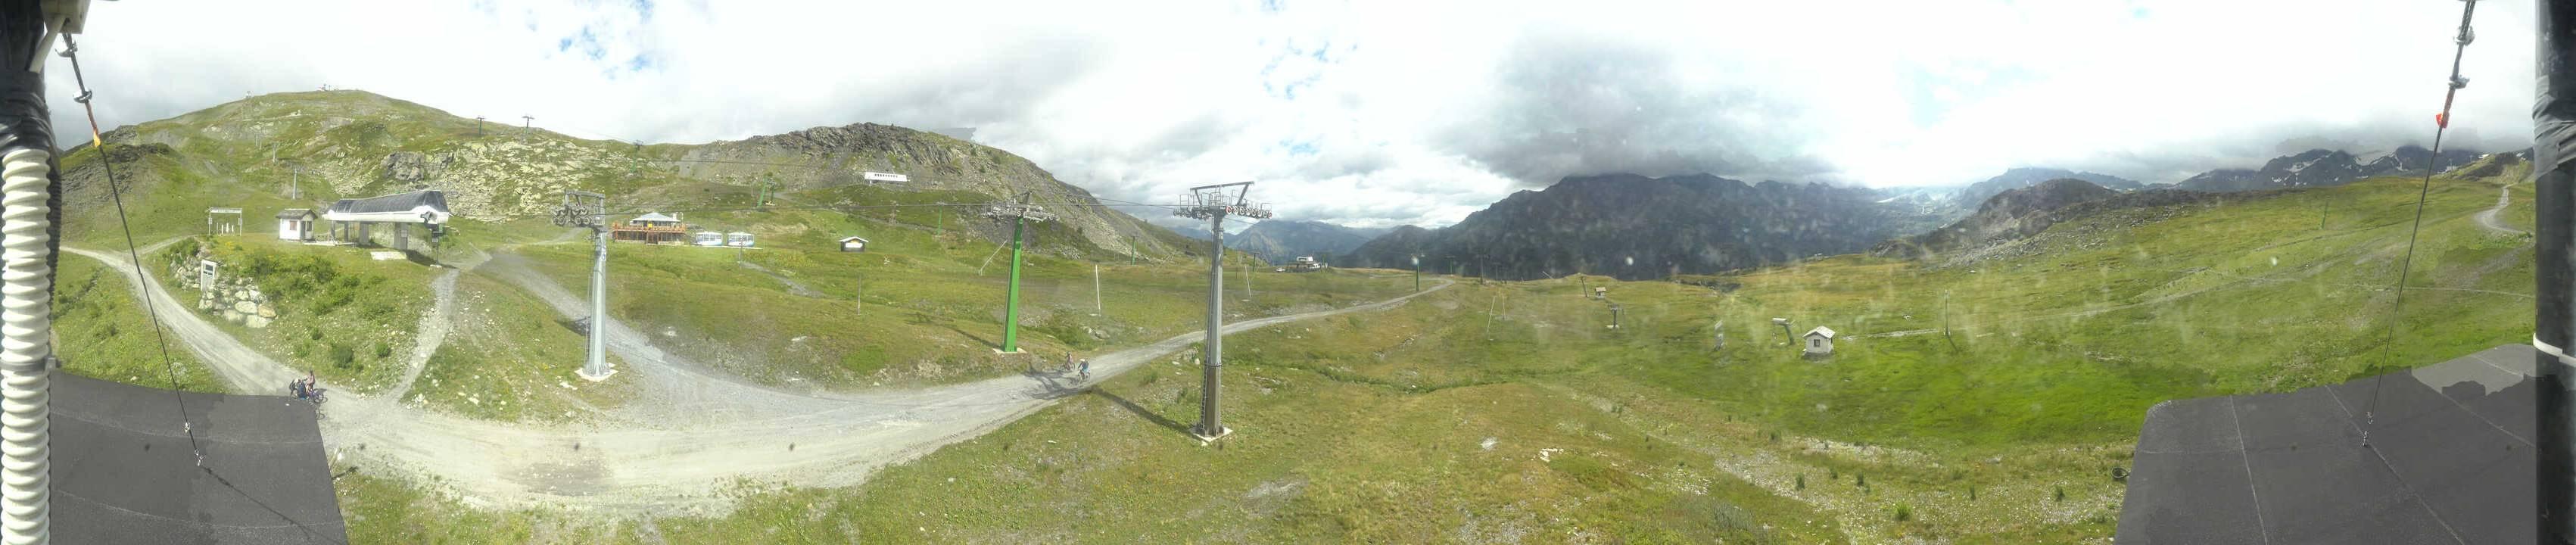 Empty La Thuile ski slopes